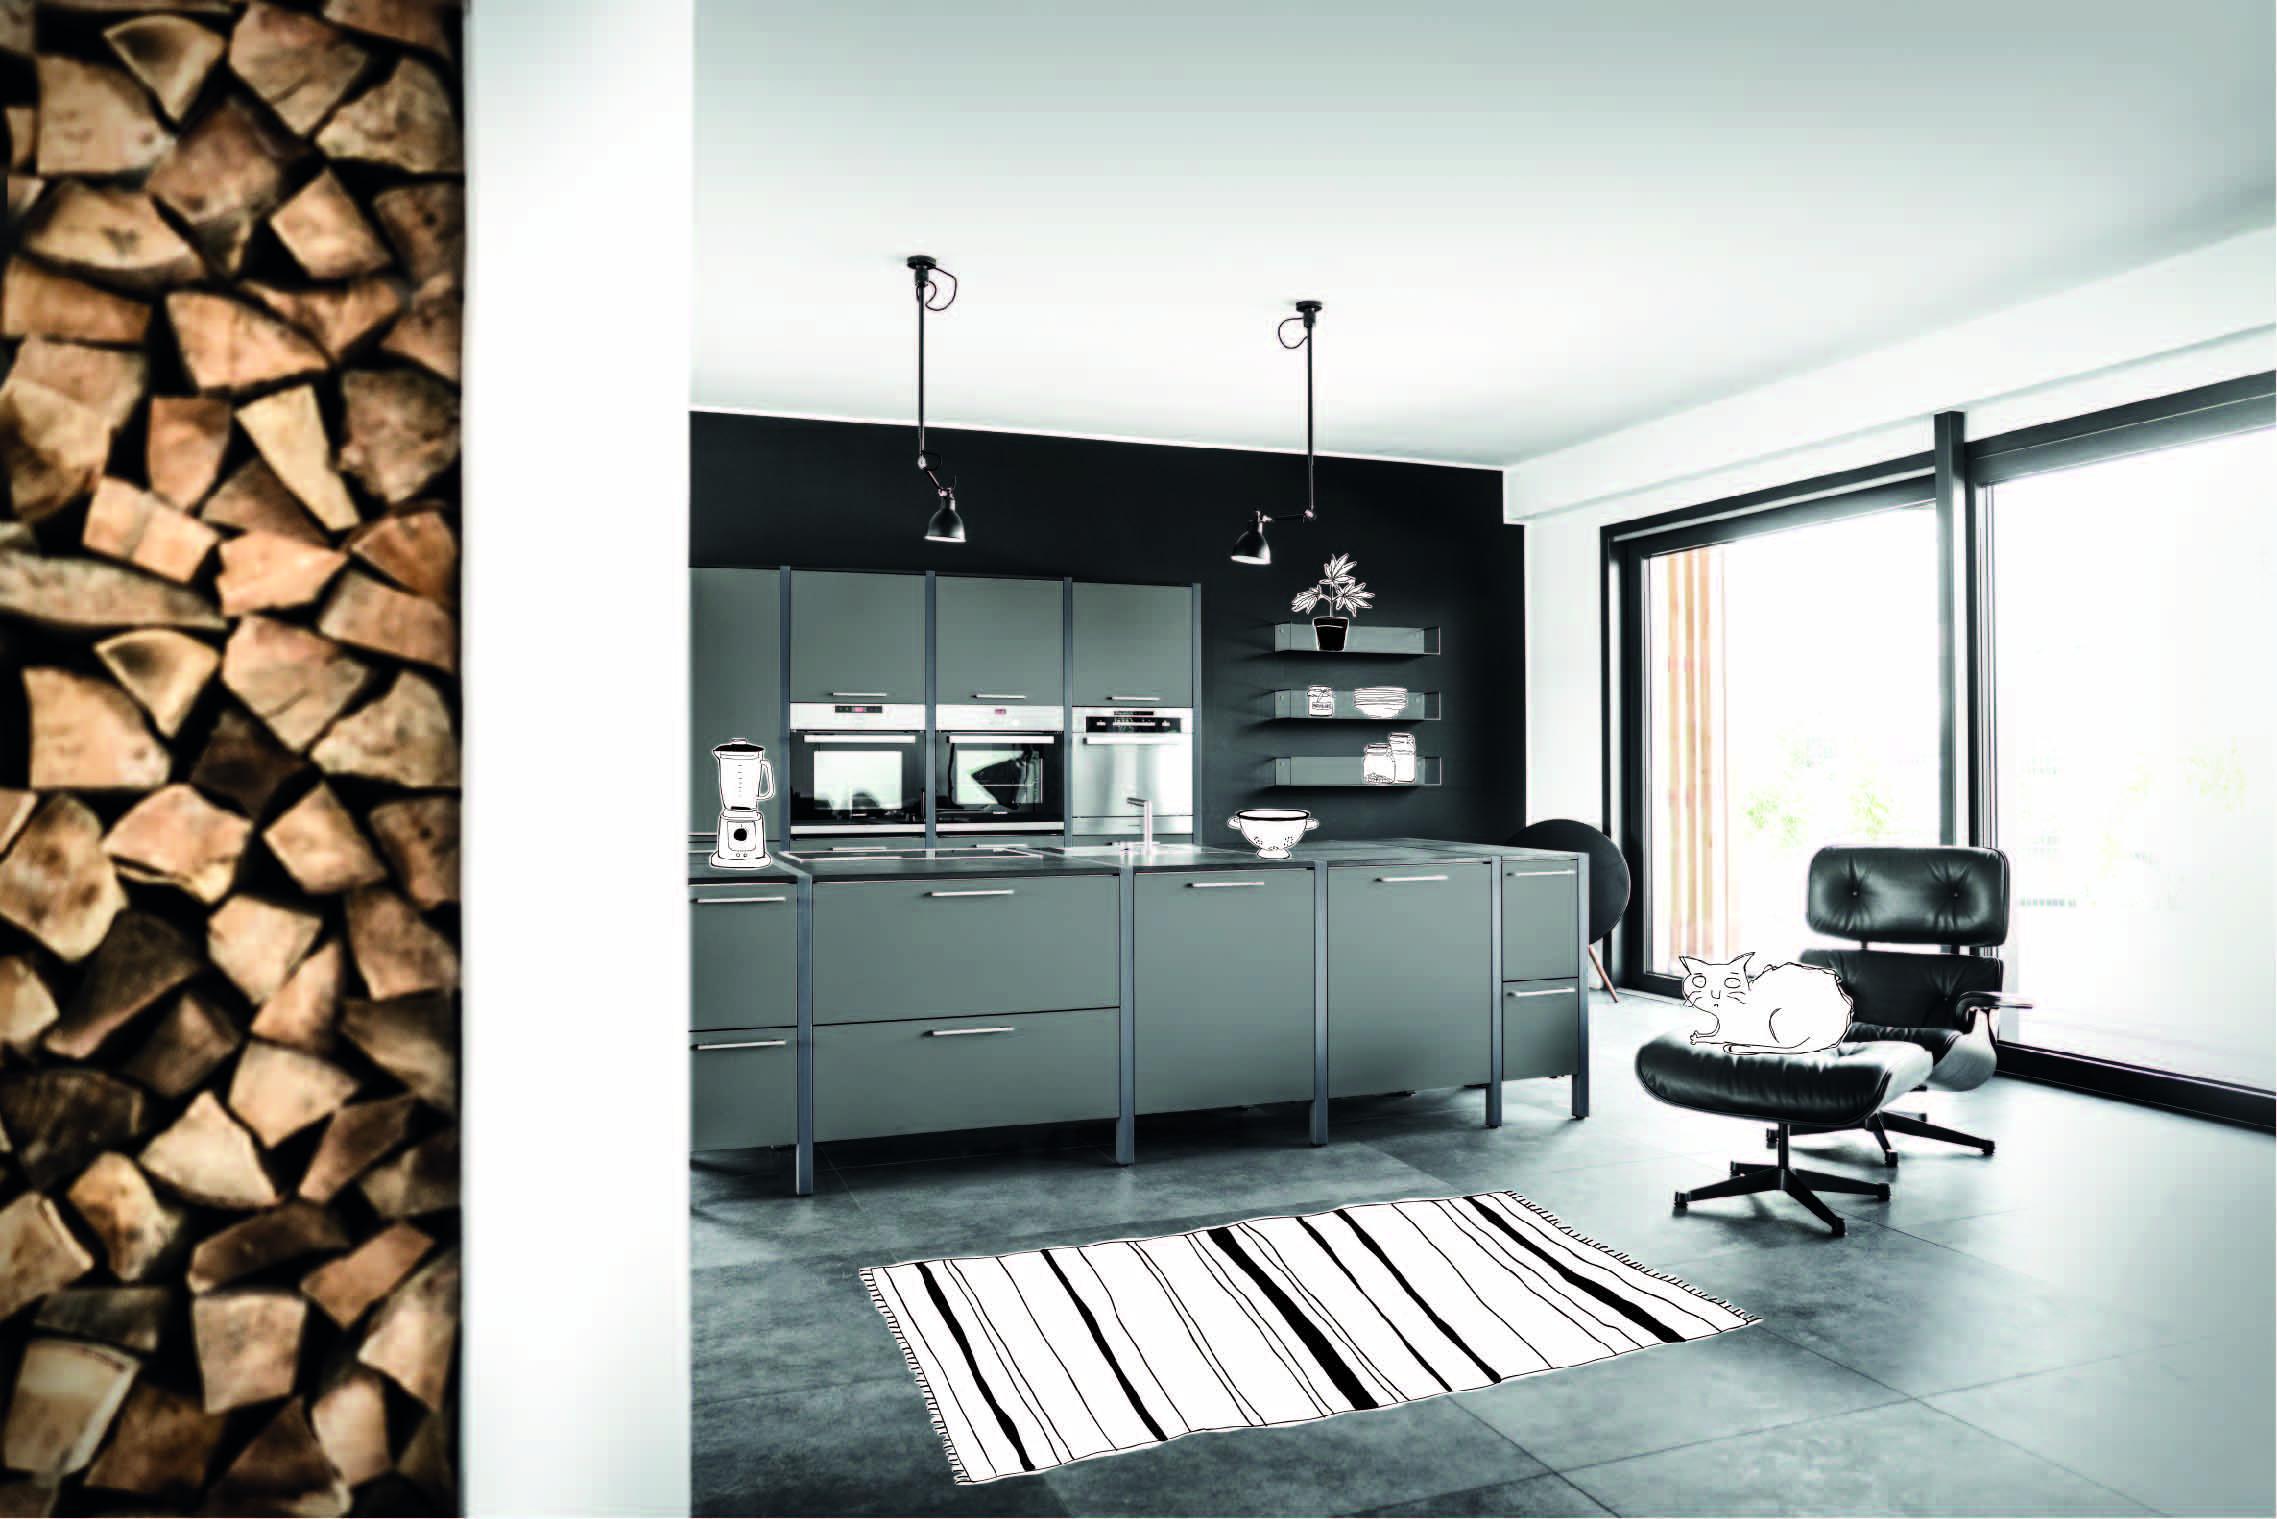 Full Size of Modulküche Ikea Modulkche Bilder Ideen Couch Holz Küche Kosten Betten Bei Sofa Mit Schlaffunktion Miniküche Kaufen 160x200 Küche Modulküche Ikea